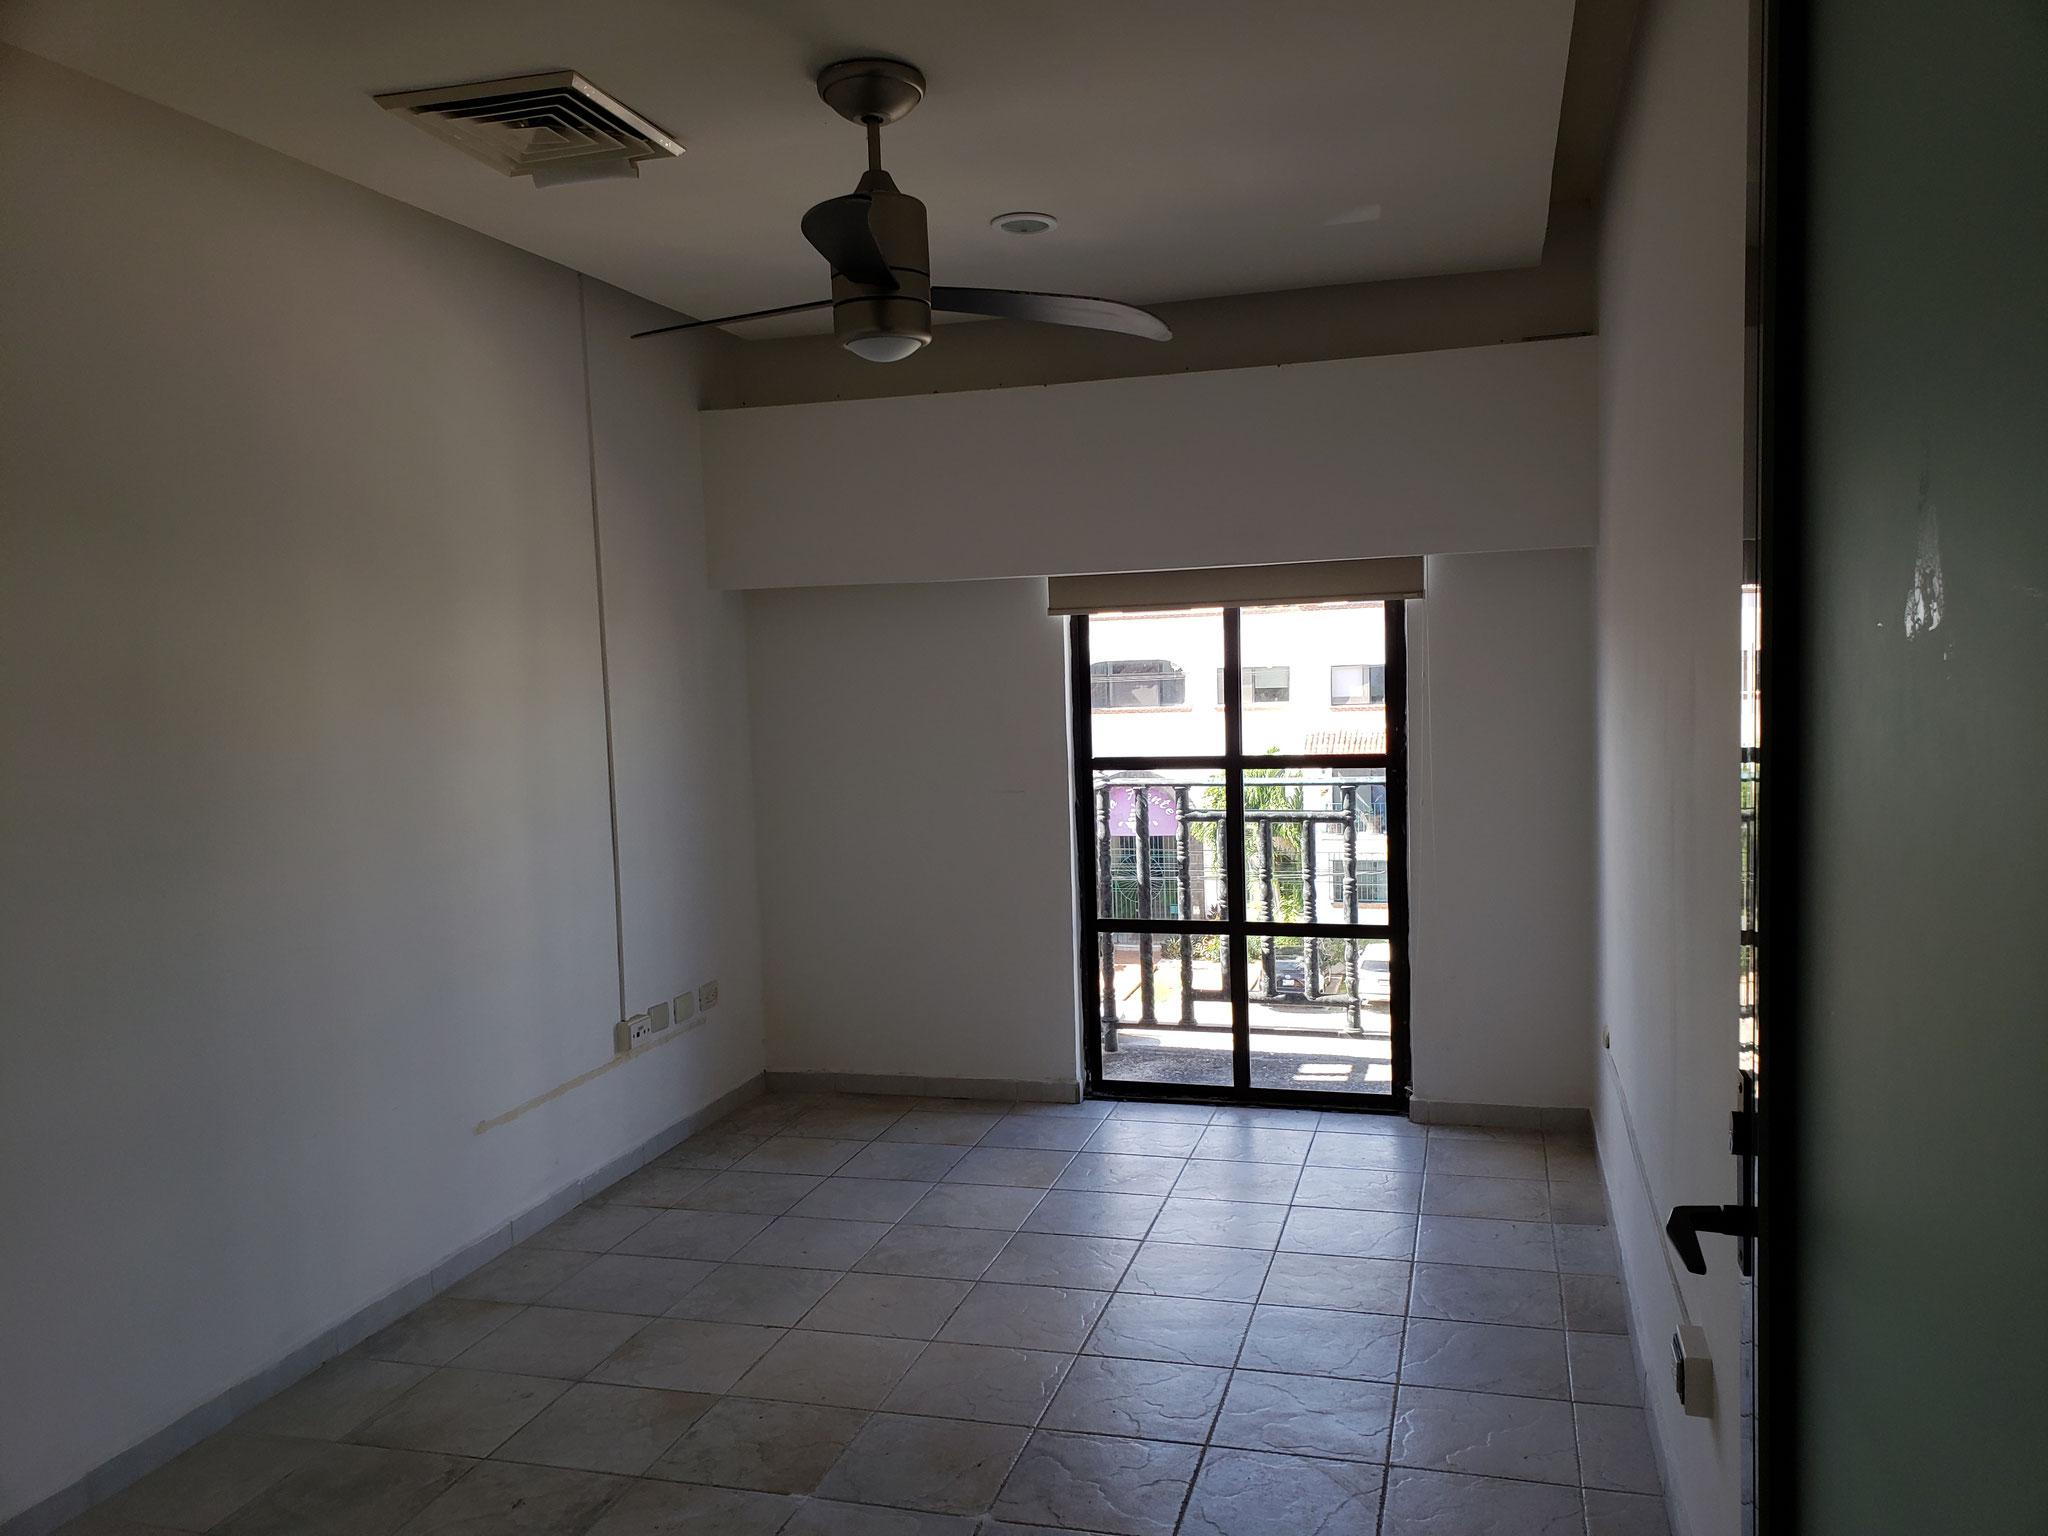 Oficina en renta en  SM 15, Cancún, Q. Roo, Conjunto San Angel Inn